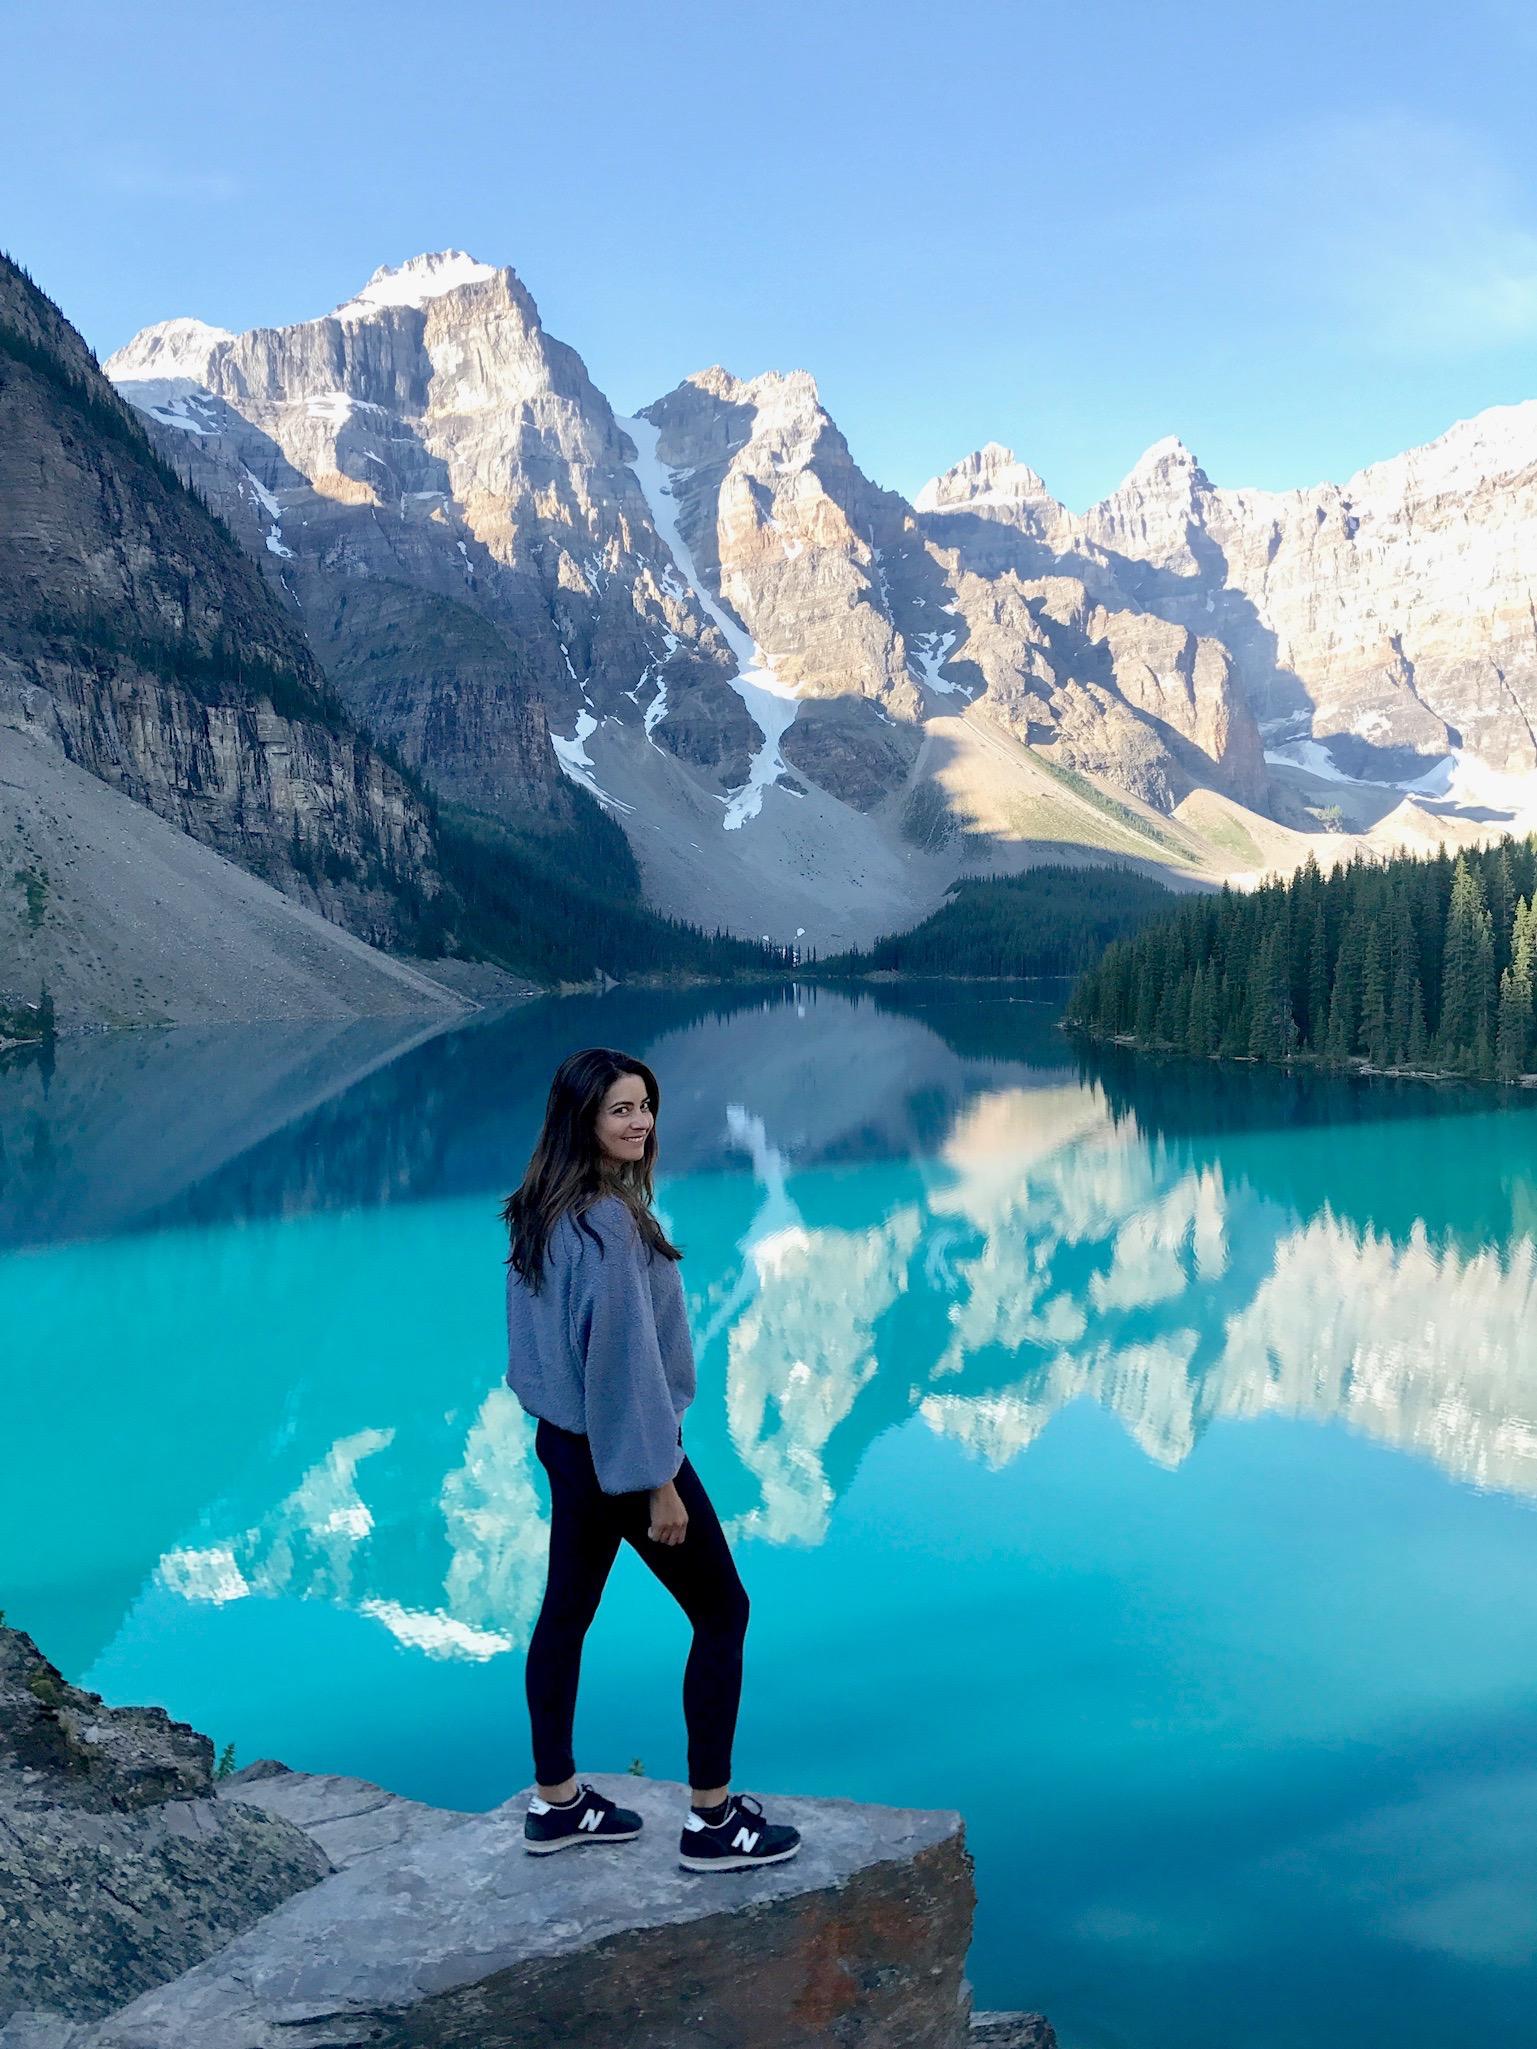 Banff, Alberta. Canada: 2017 // COMING SOON